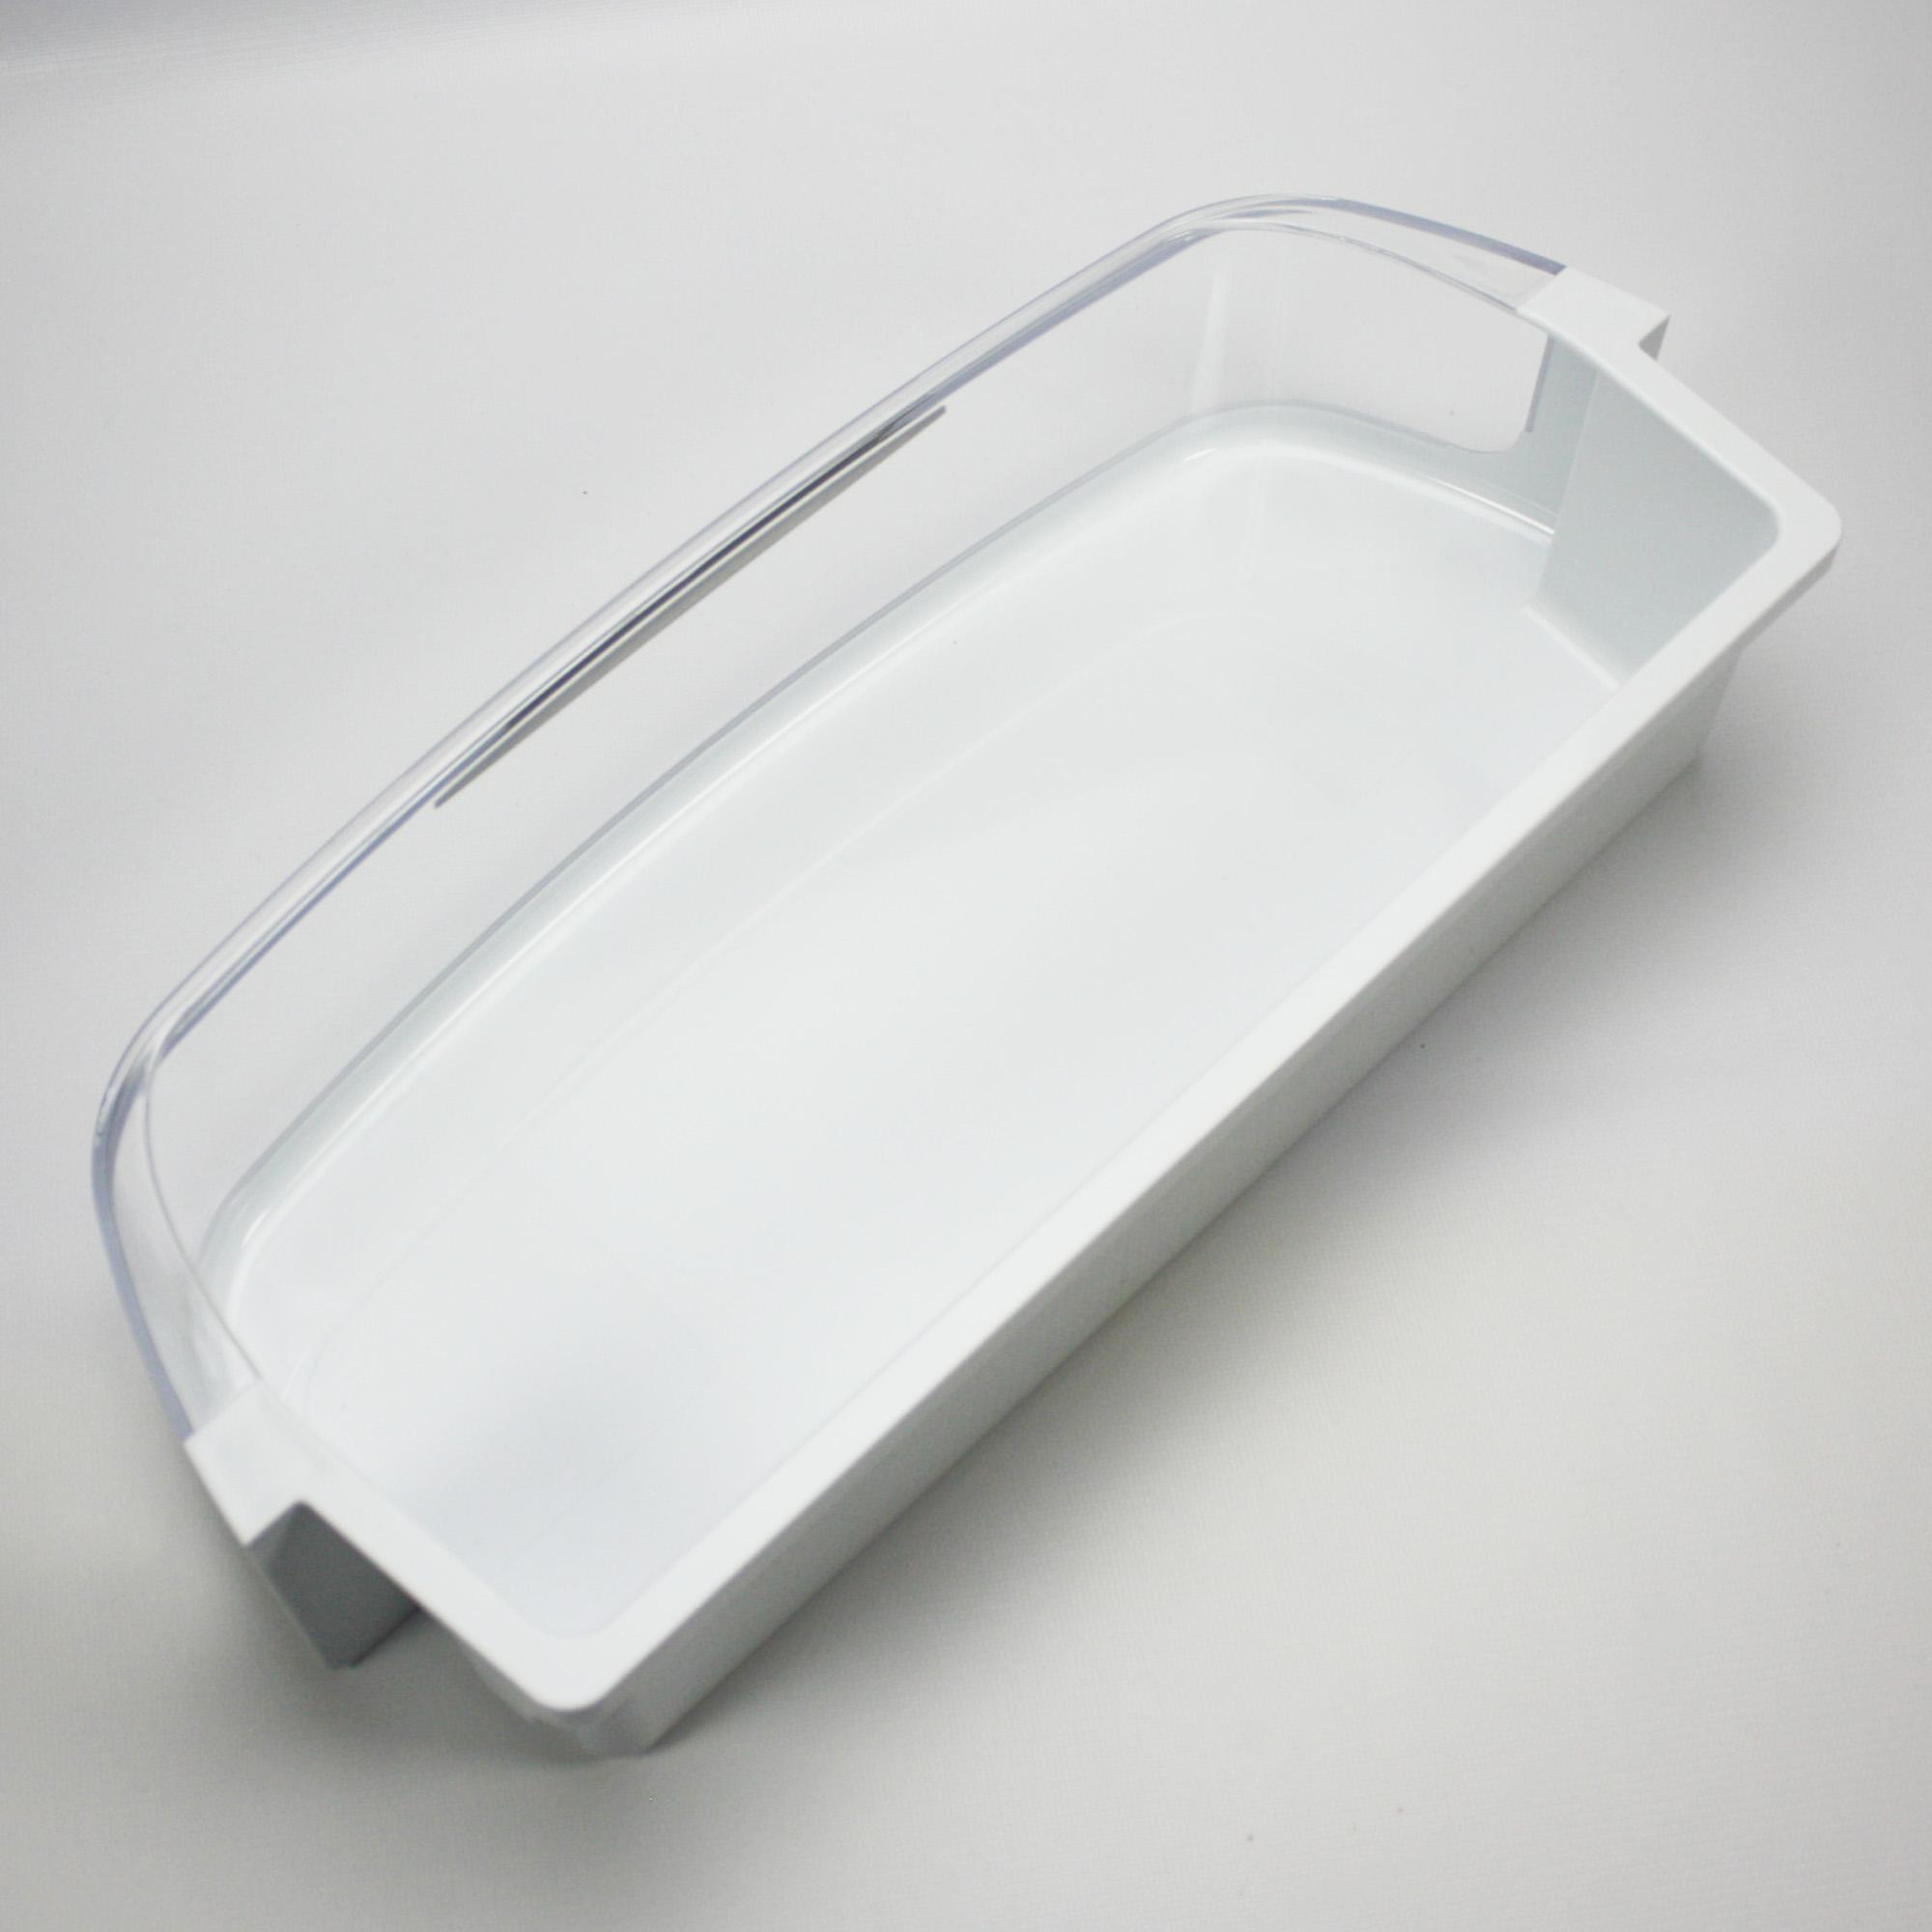 wpw10160952 whirlpool refrigerator door shelf bin. Black Bedroom Furniture Sets. Home Design Ideas